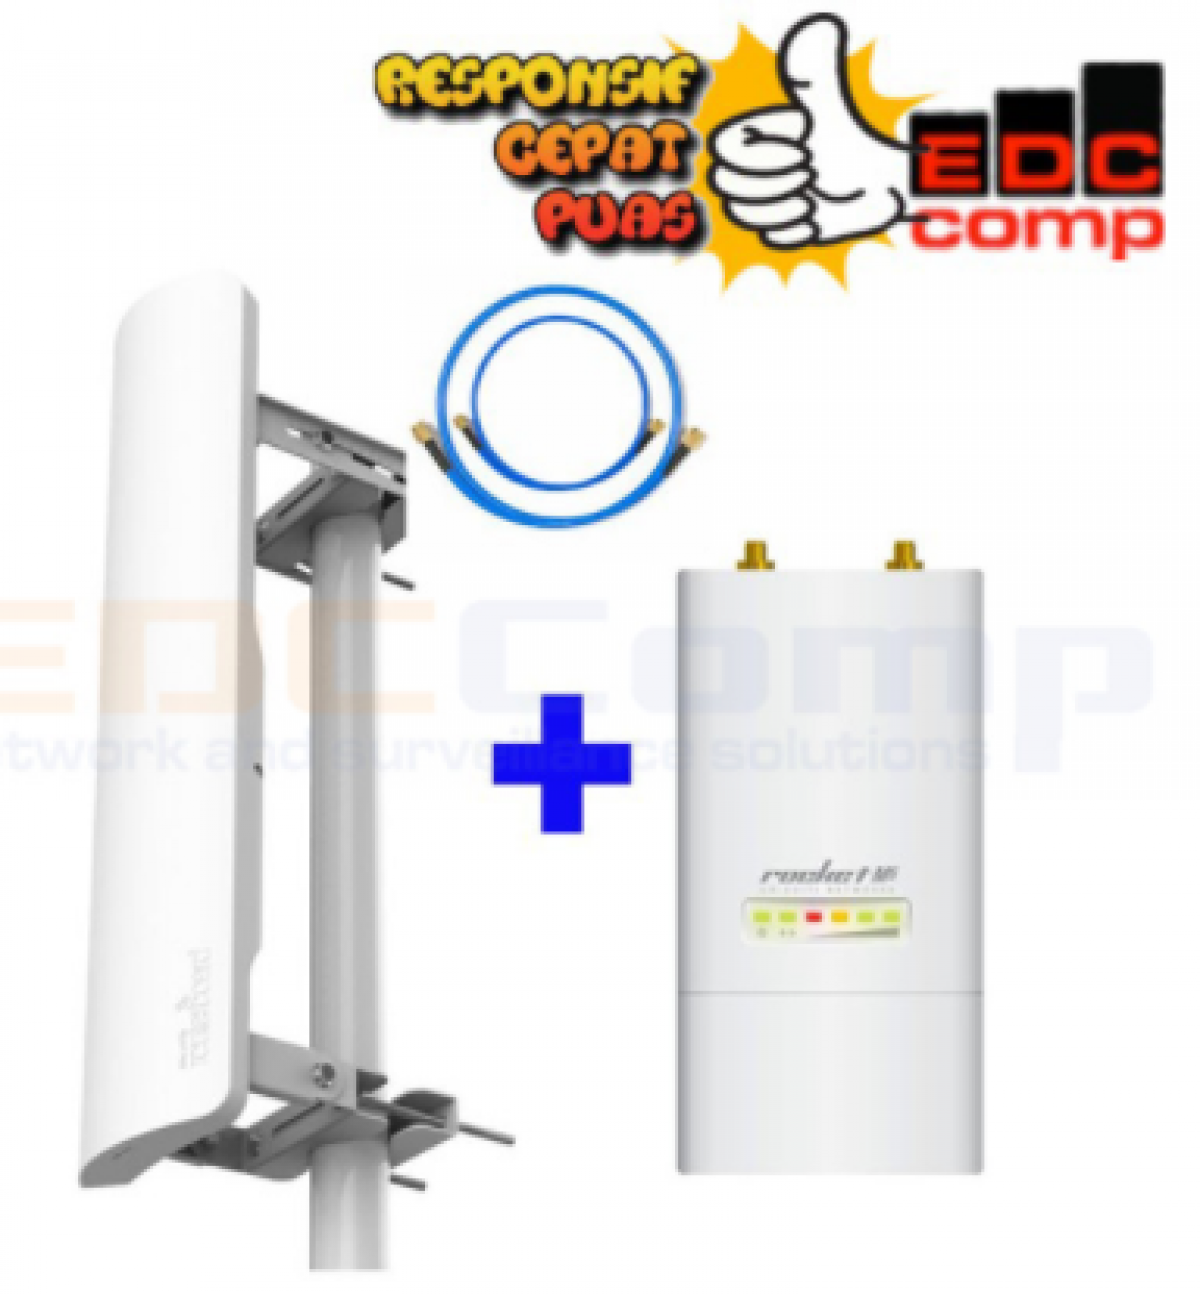 Paket Ubiquiti RM5 Rocket M5 + mANT 19S 120 Sector Antenna - EdcComp